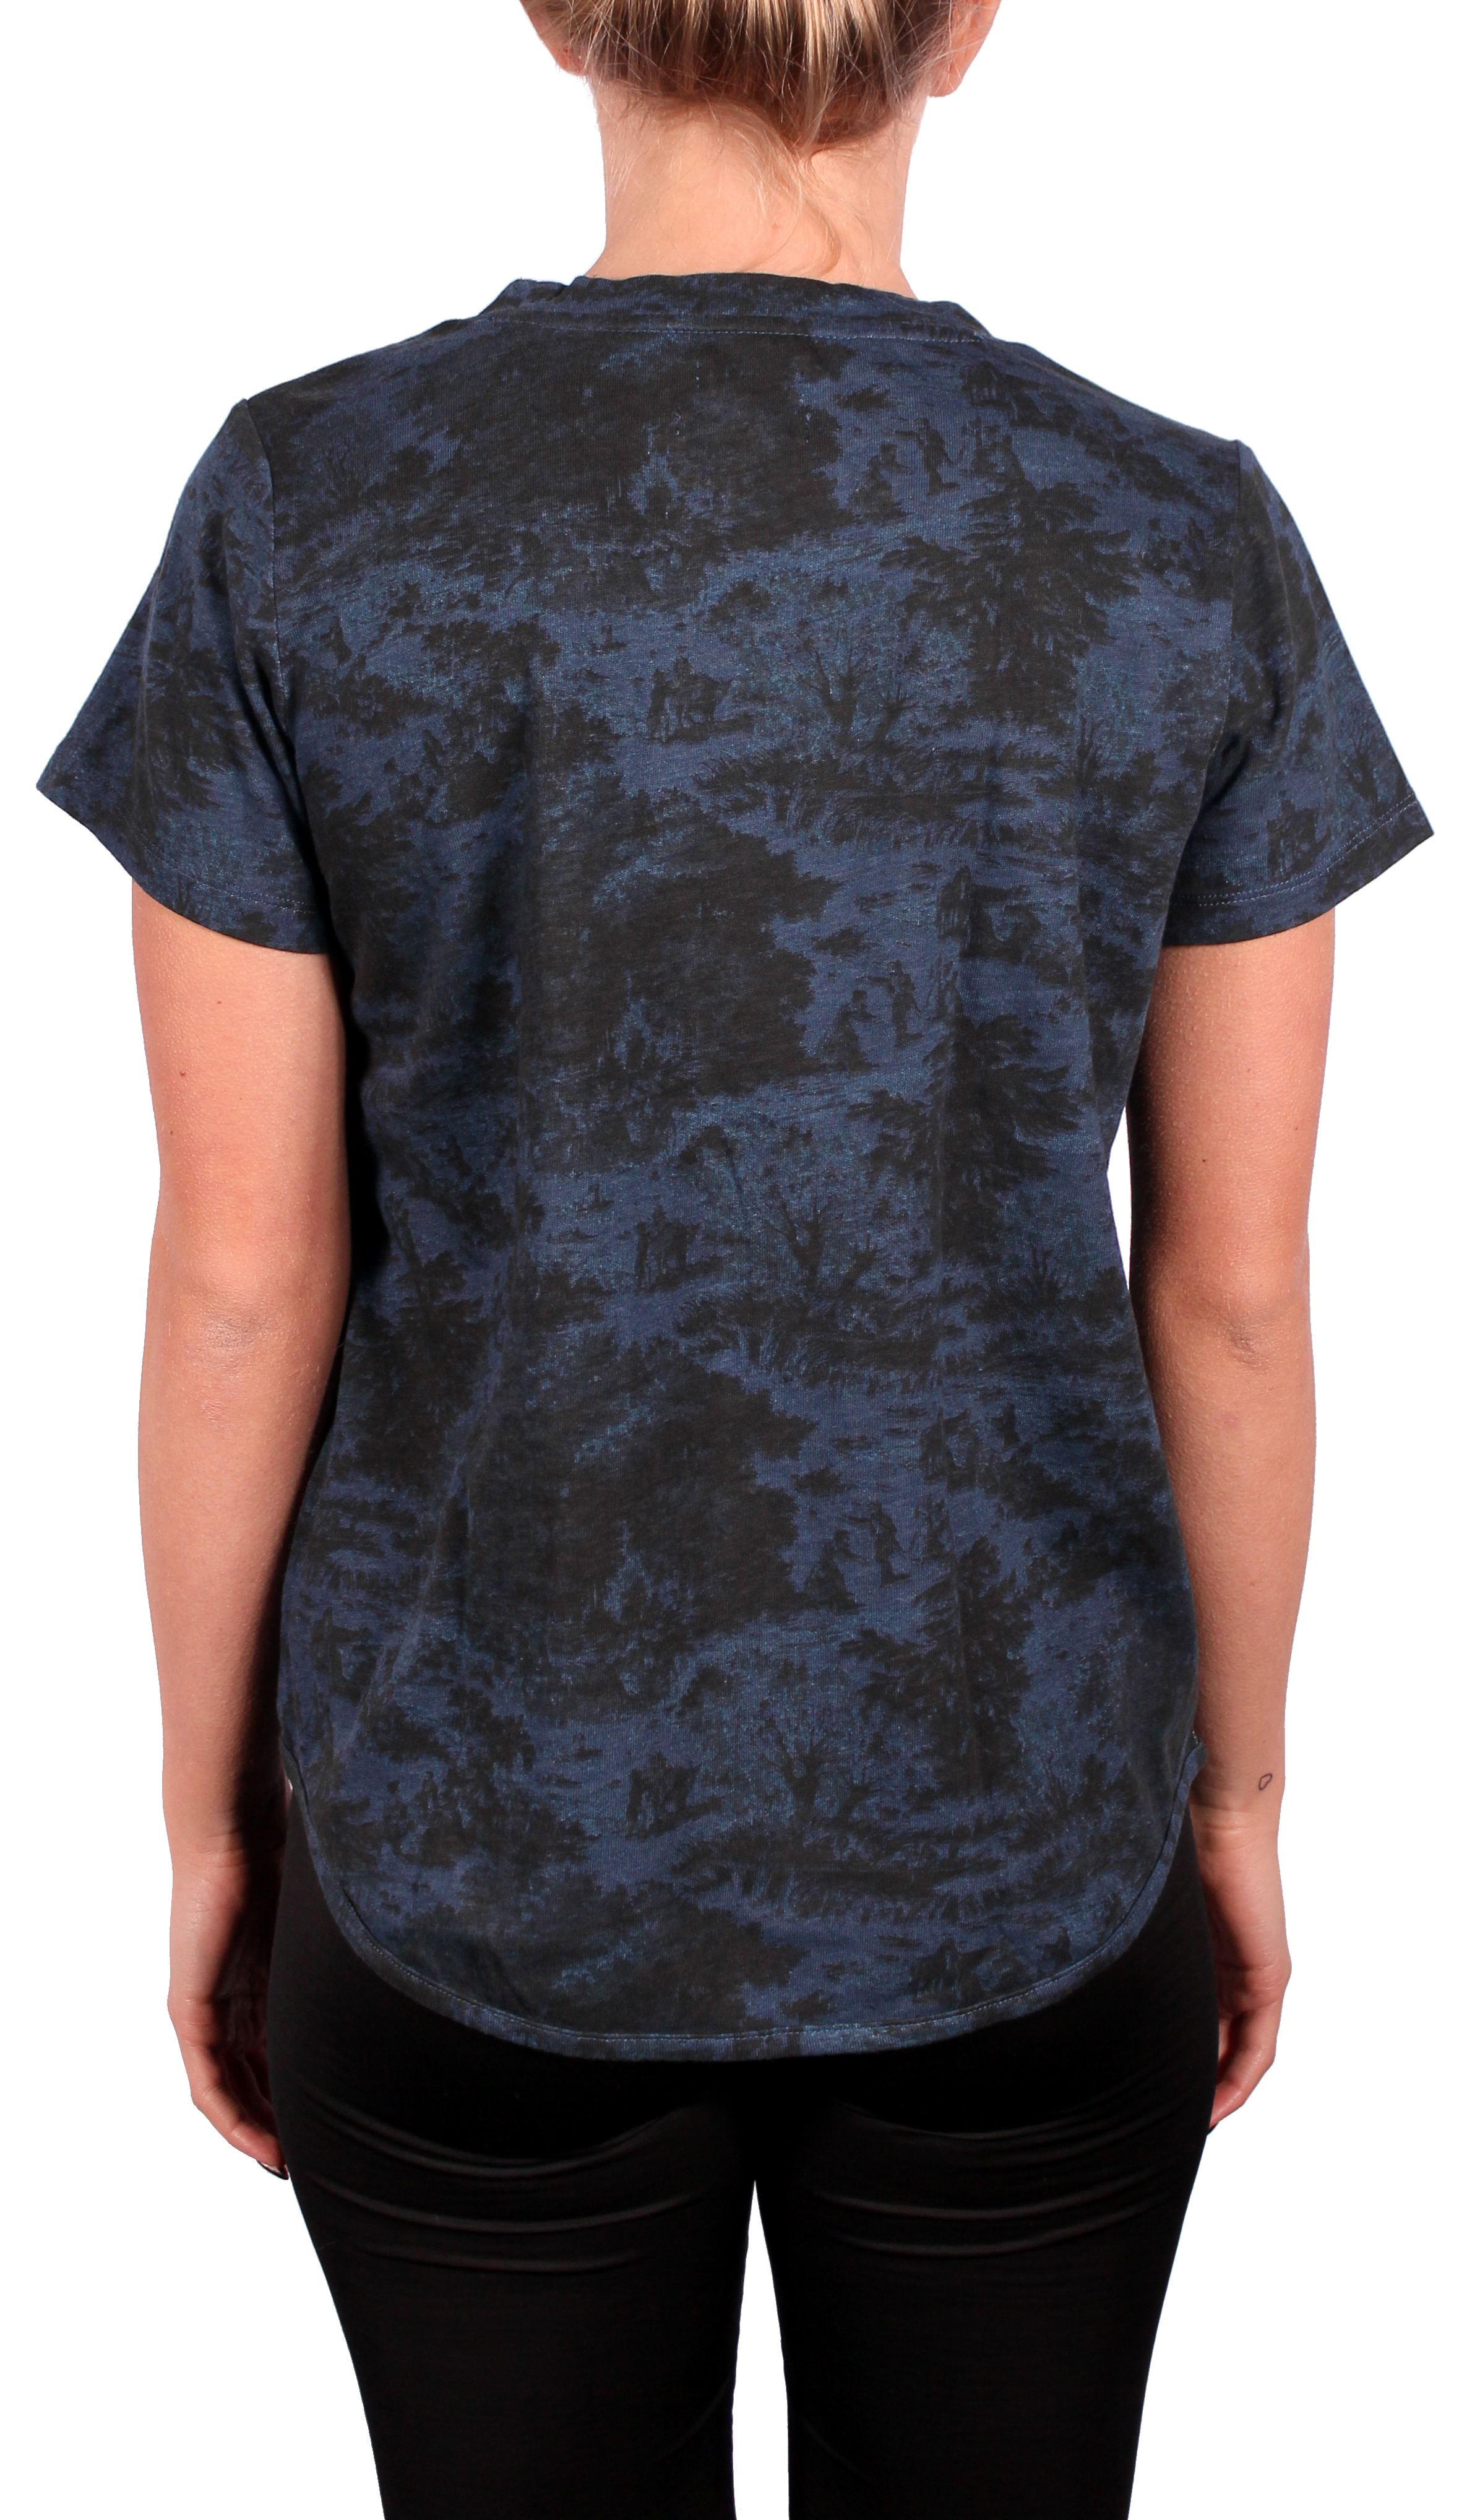 Koszulka Damska Burton Stke Tee (Eclipse Forest)